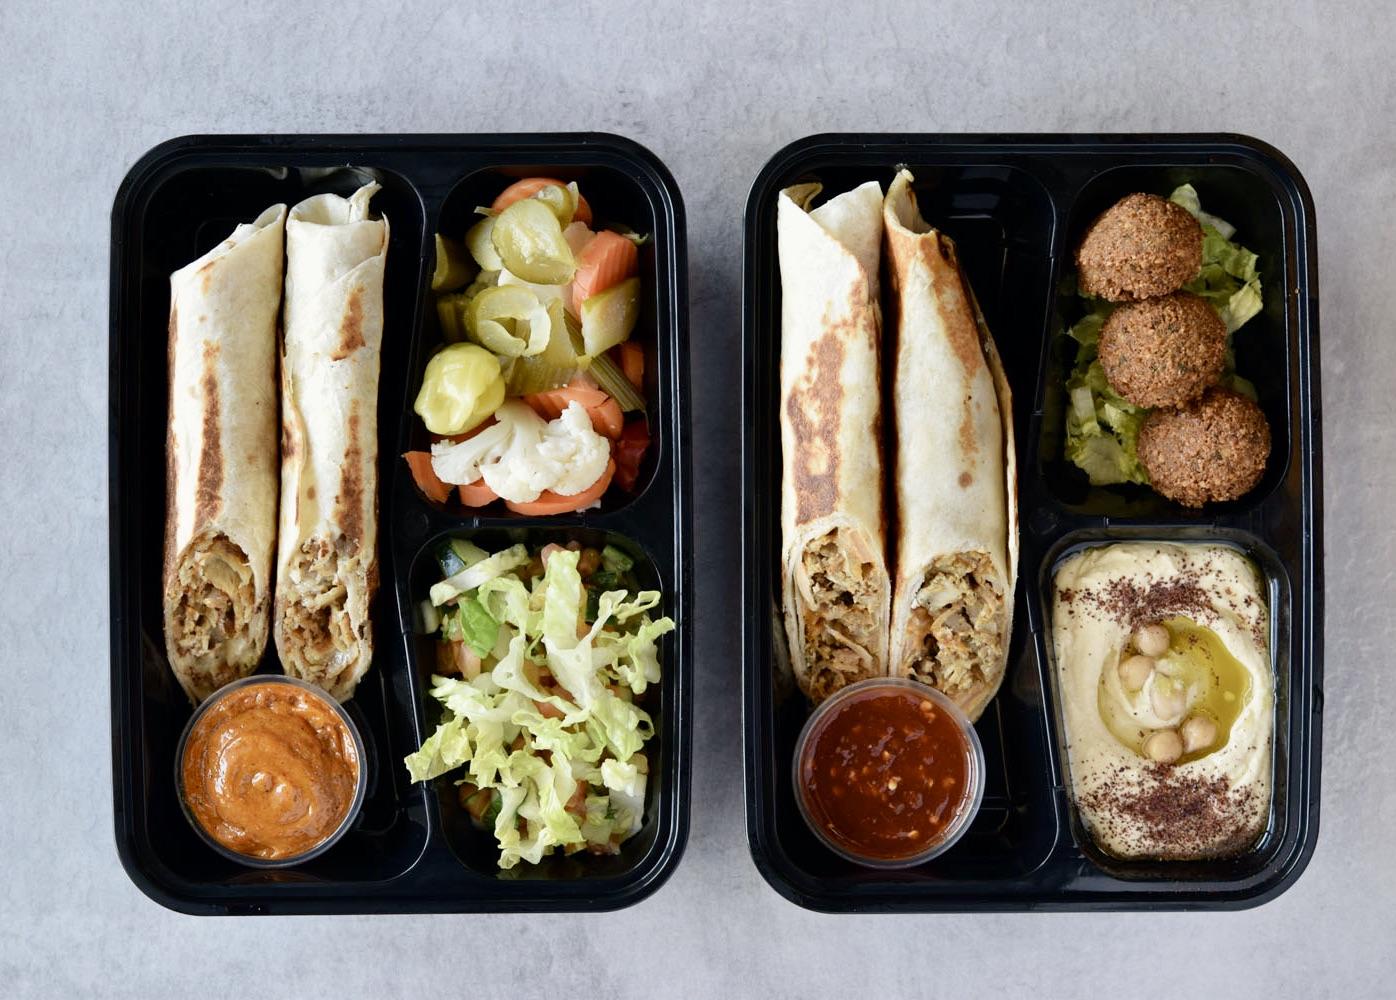 Shawarma Meal 2 plates-ws